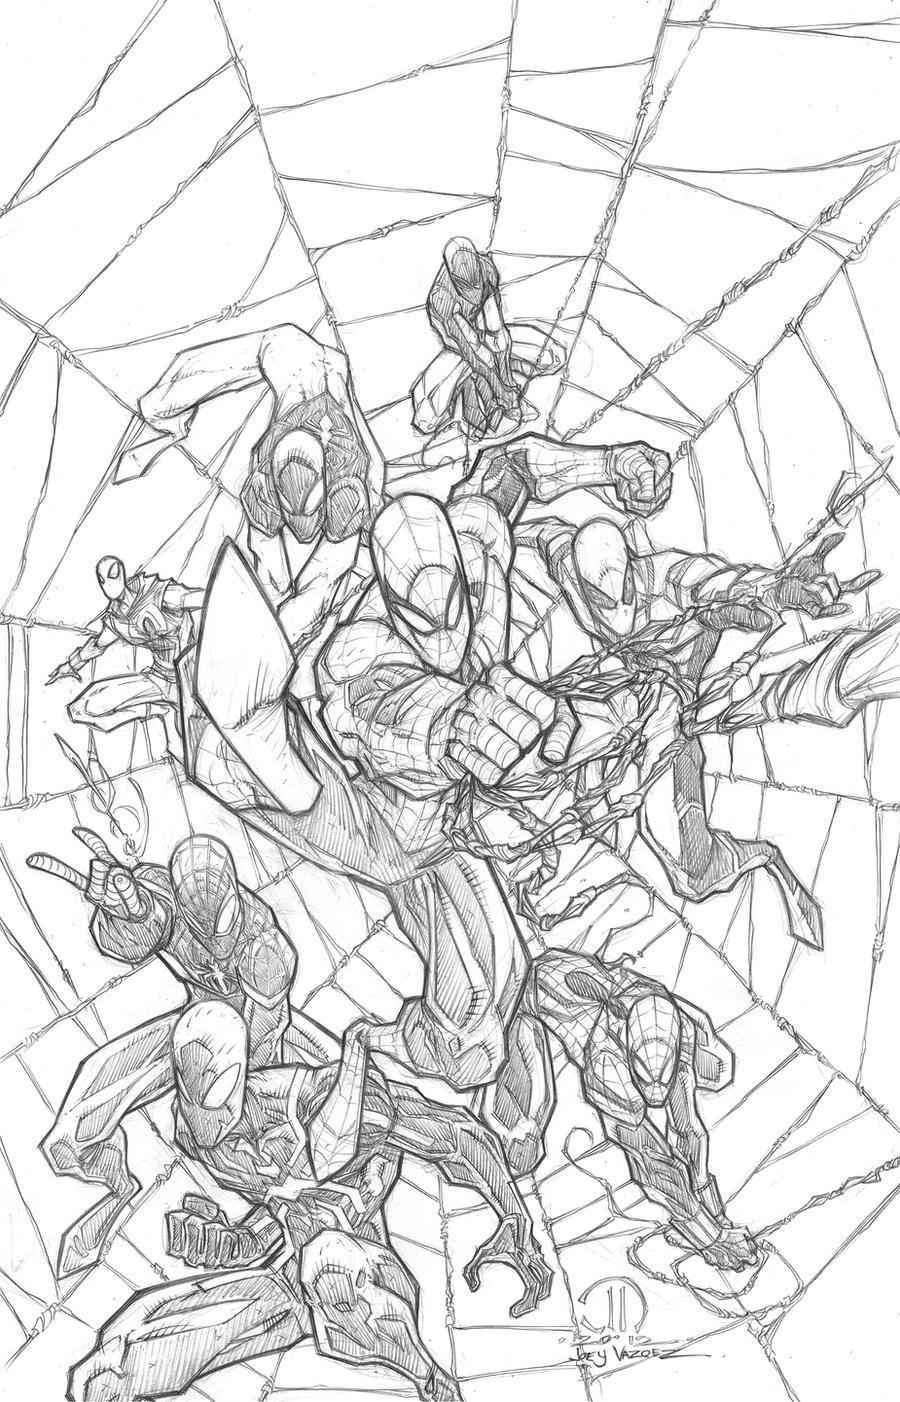 SPIDERMAN MONTAGE COMMISSION by JoeyVazquez